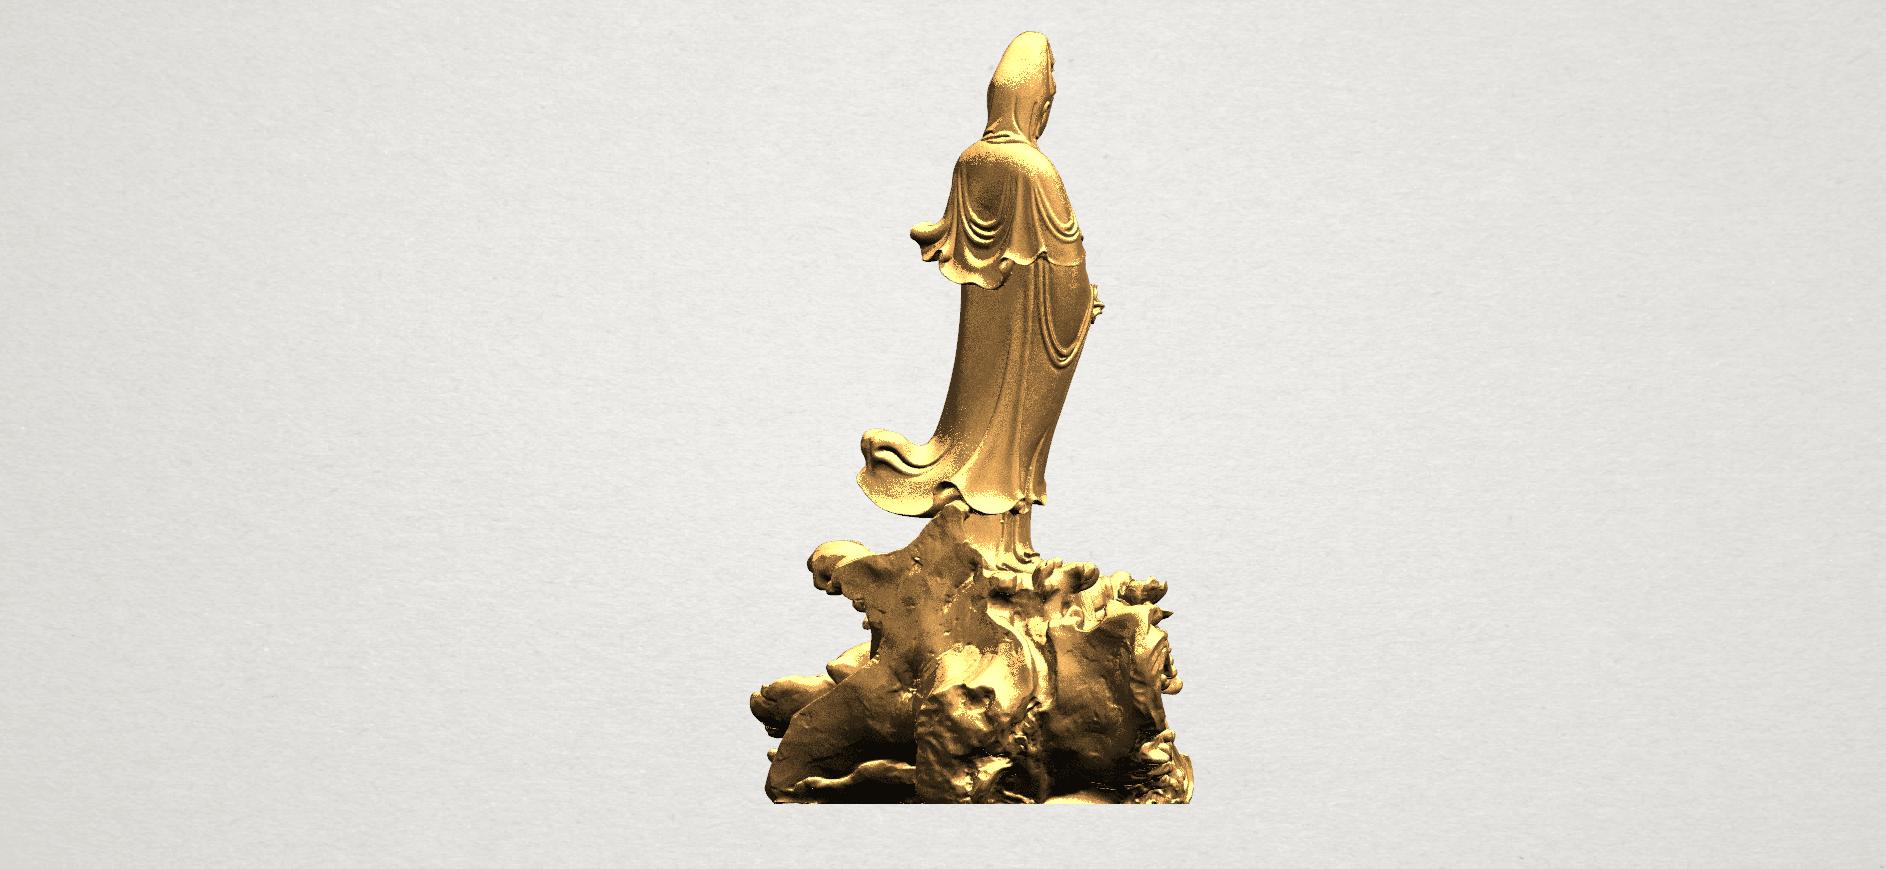 Avalokitesvara Buddha - Standing (ii) A06.png Download free STL file Avalokitesvara Bodhisattva - Standing 02 • Design to 3D print, GeorgesNikkei